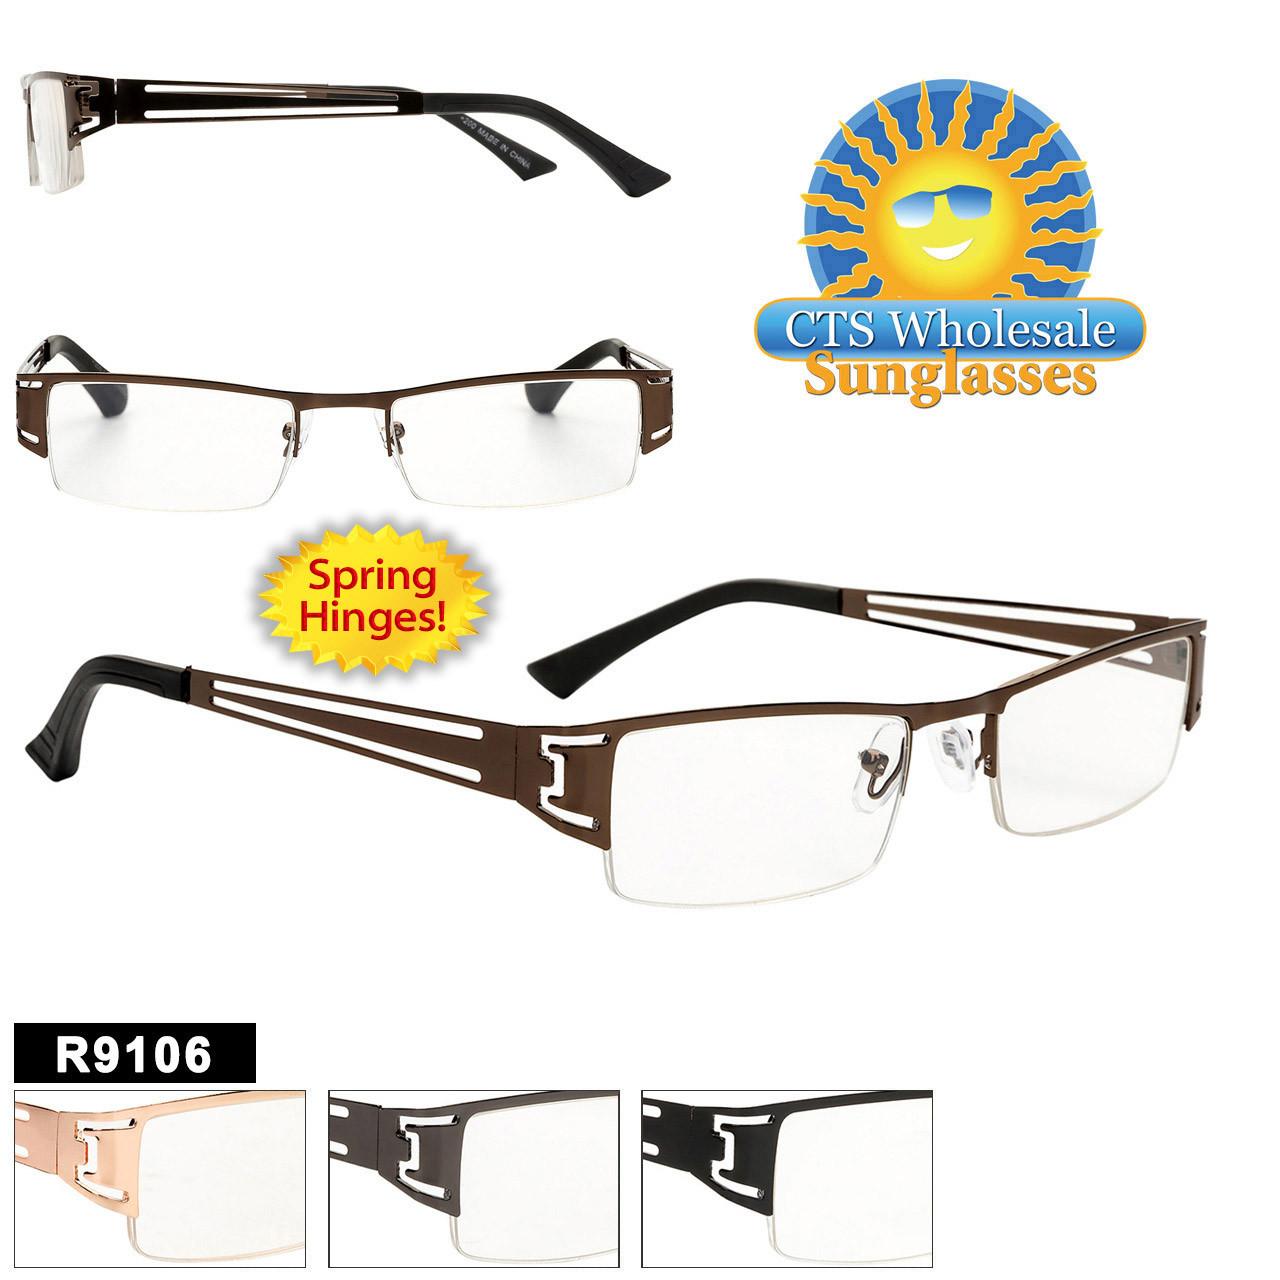 Metal Reading Glasses Wholesale - R9106